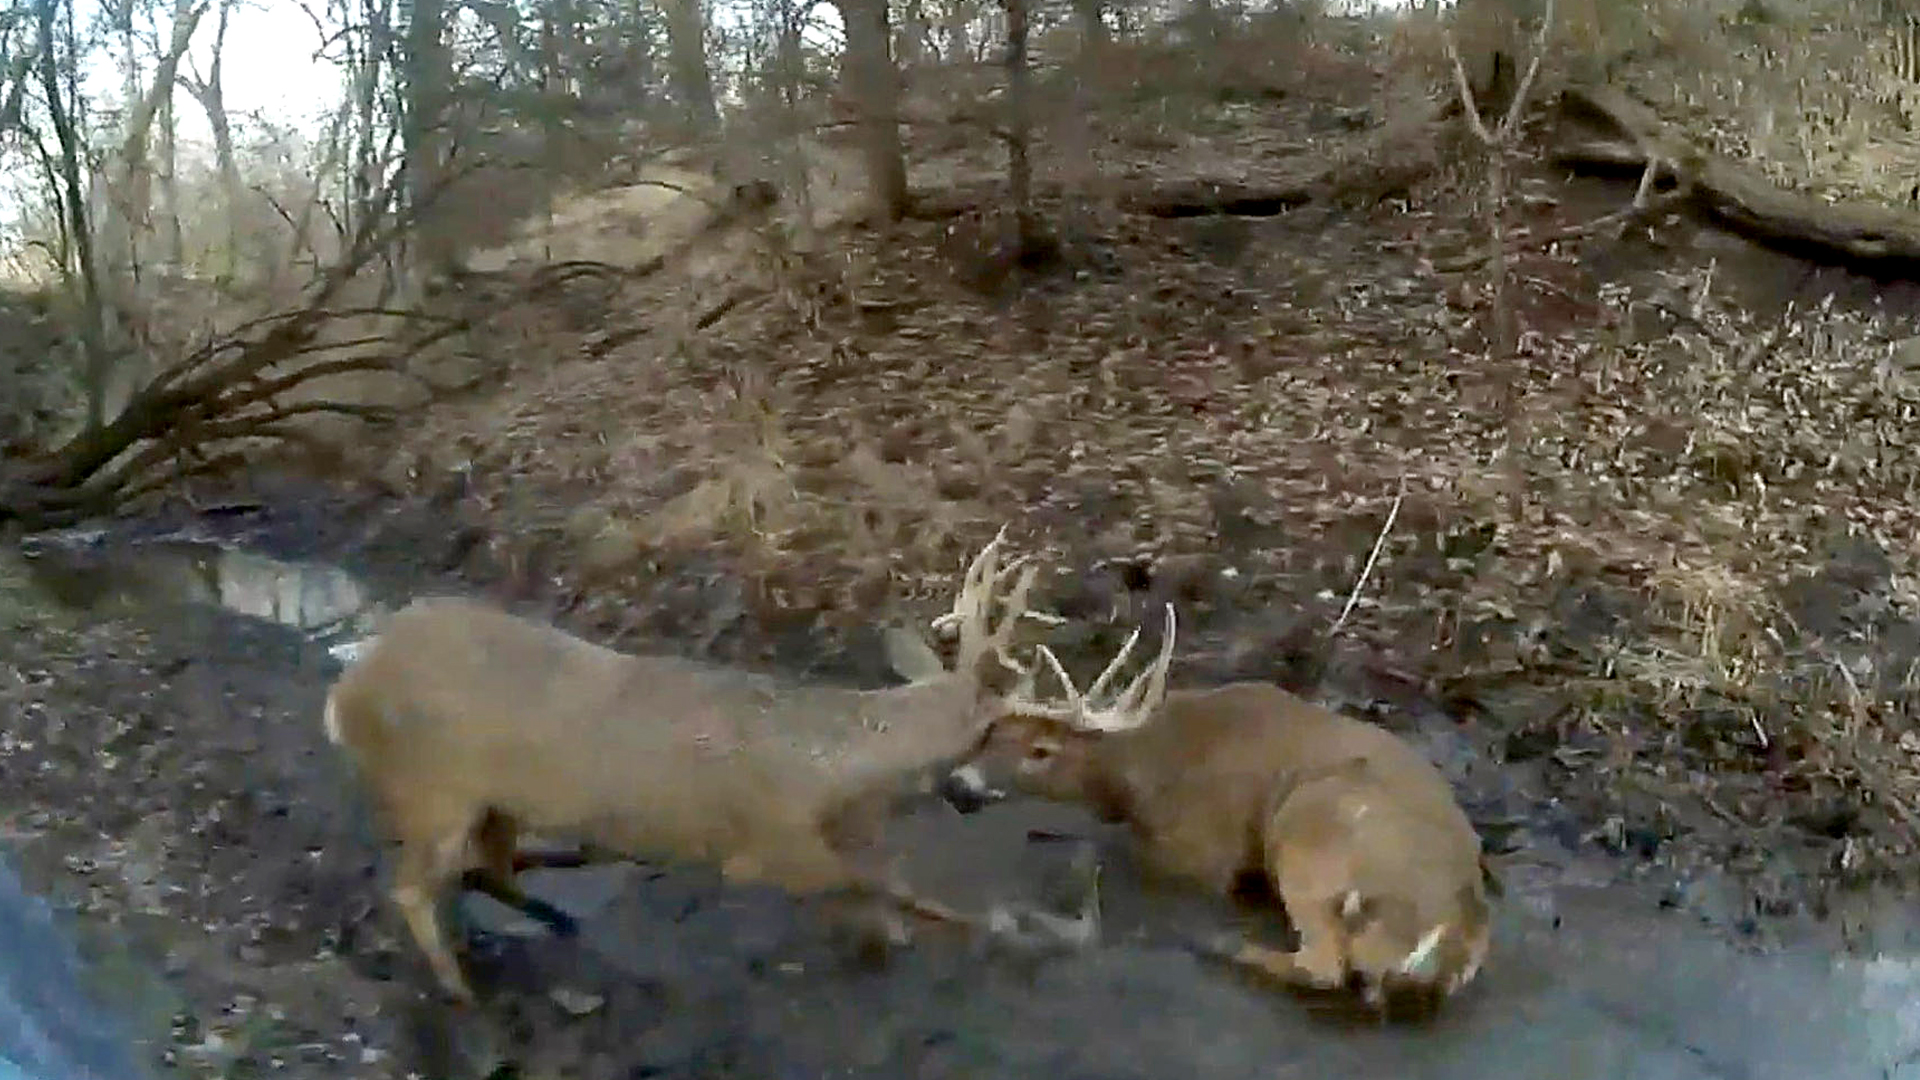 Game warden shoots at antler to save two entangled deer - Zenger News